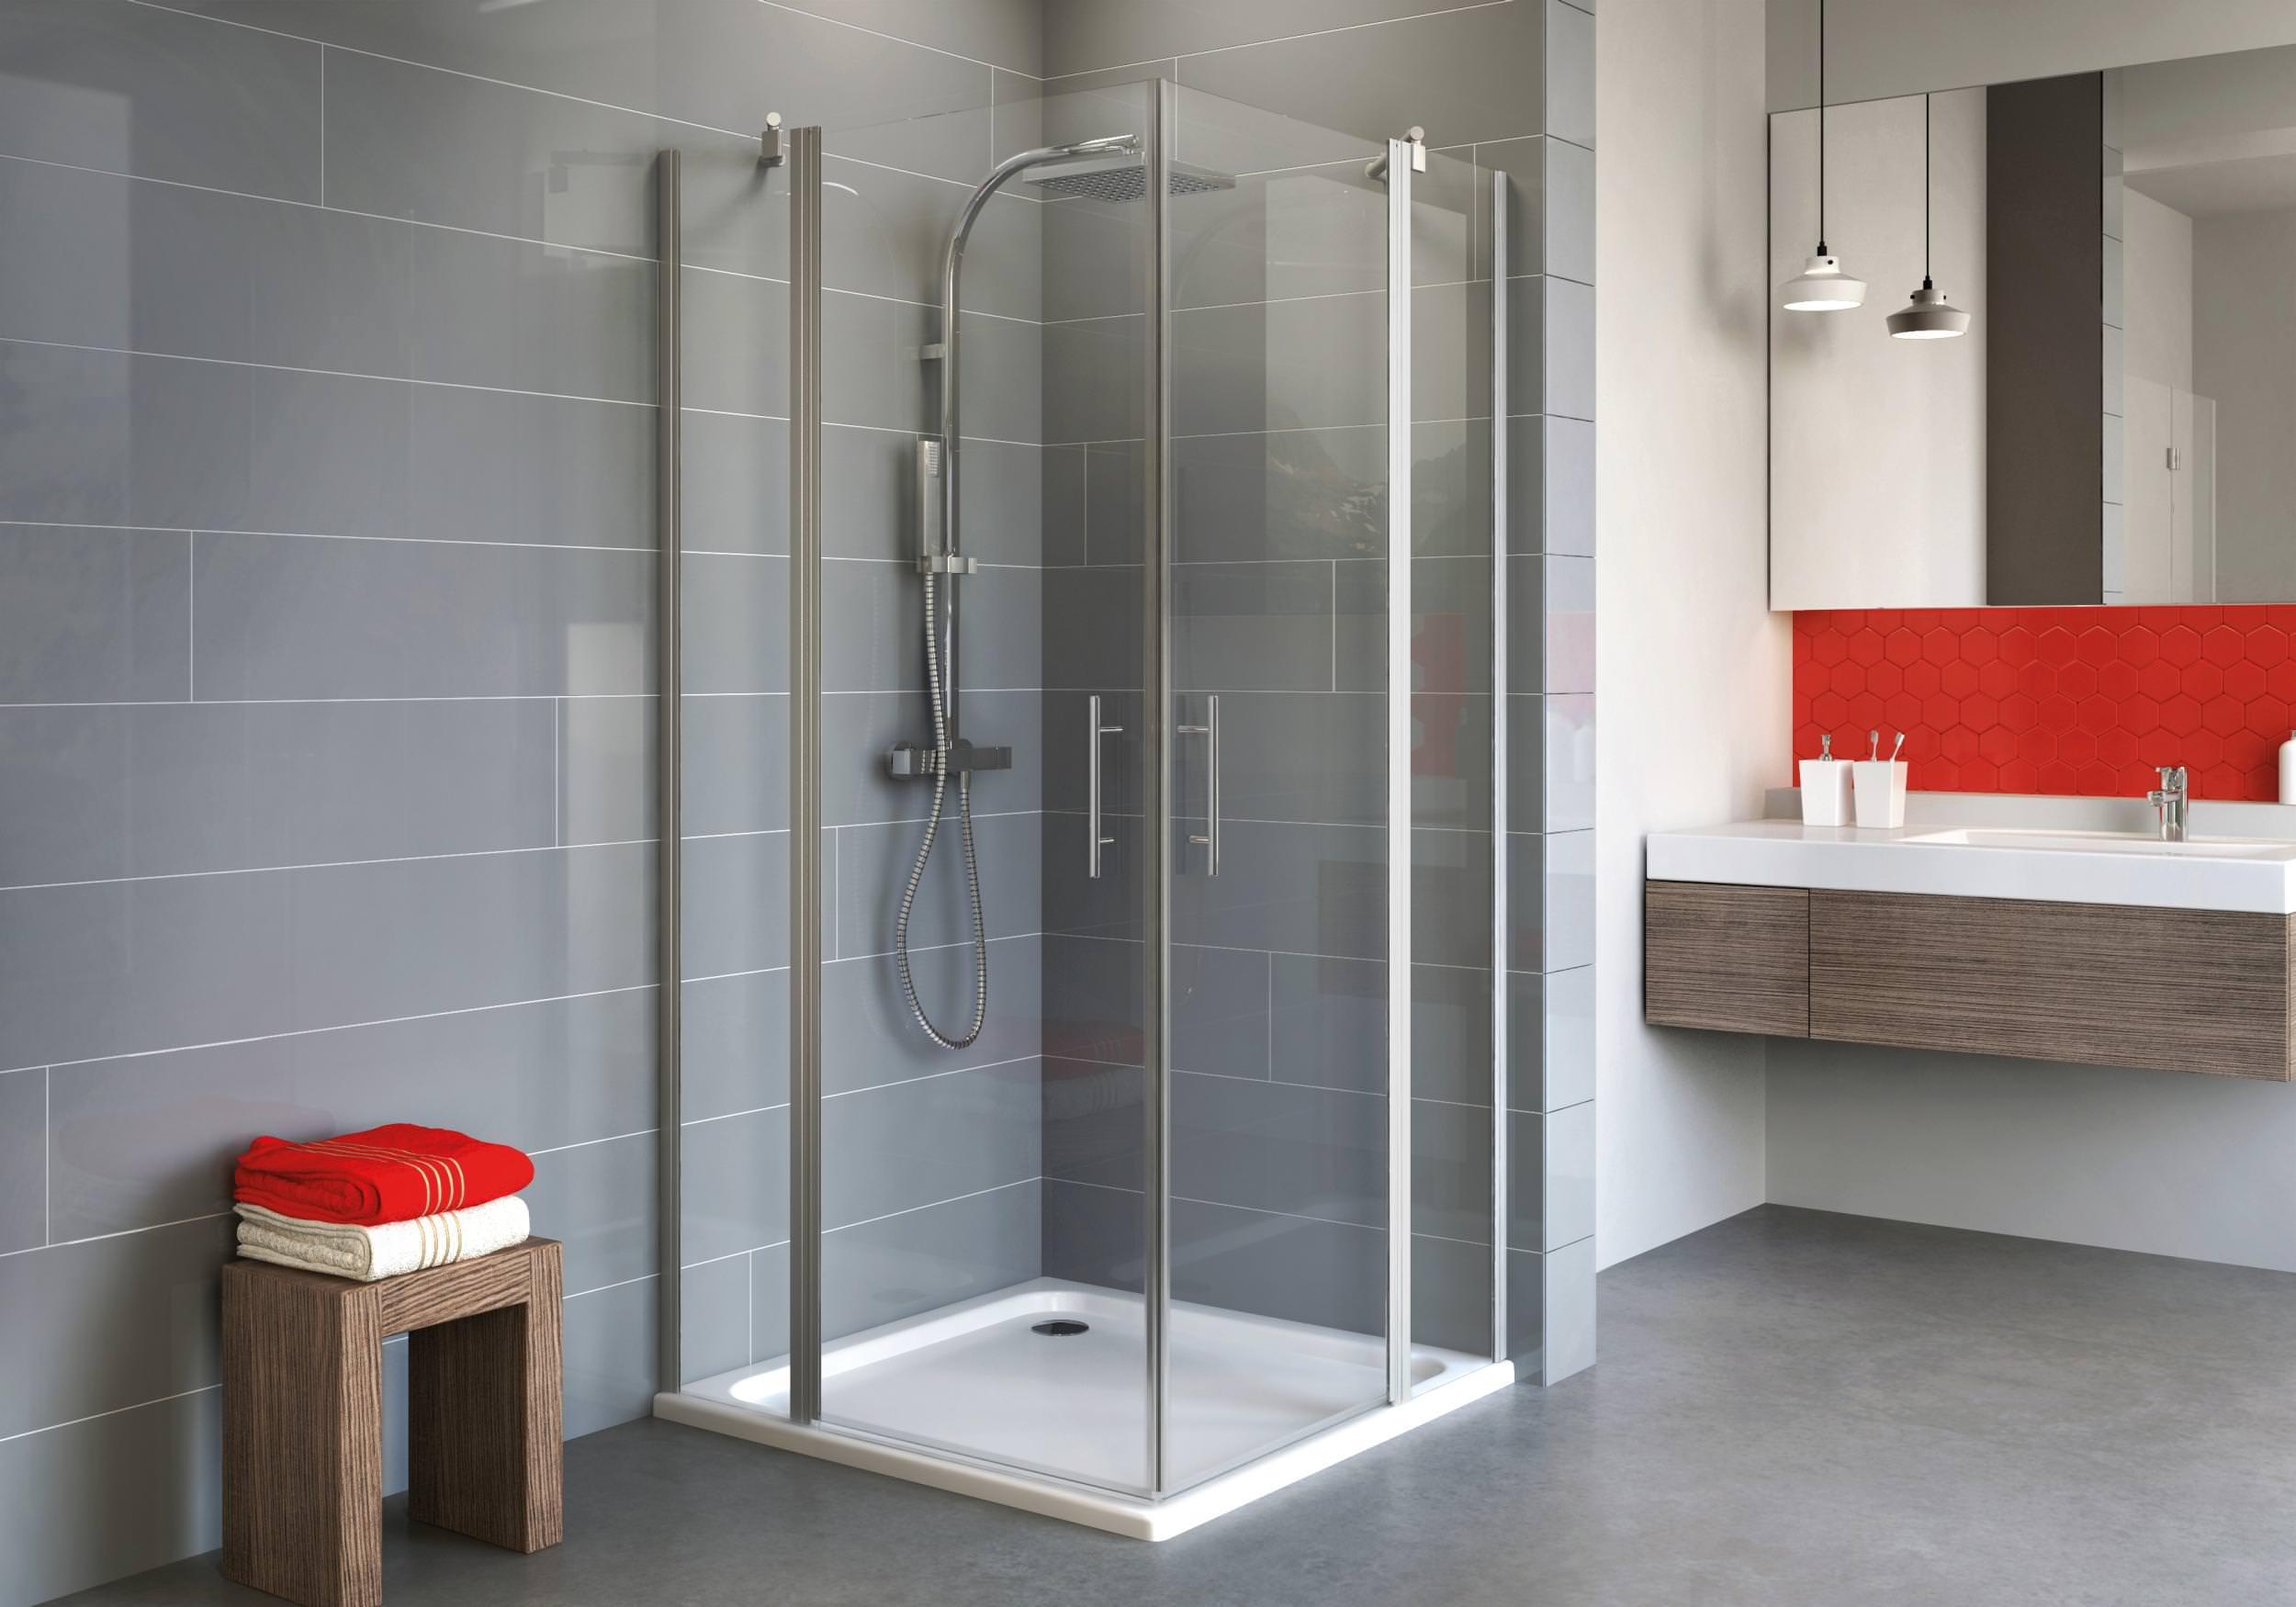 schulte alexa style 2 0 eckeinstieg 4 teilig klarglas hell alunatur 80 x 80 cm 192 cm. Black Bedroom Furniture Sets. Home Design Ideas